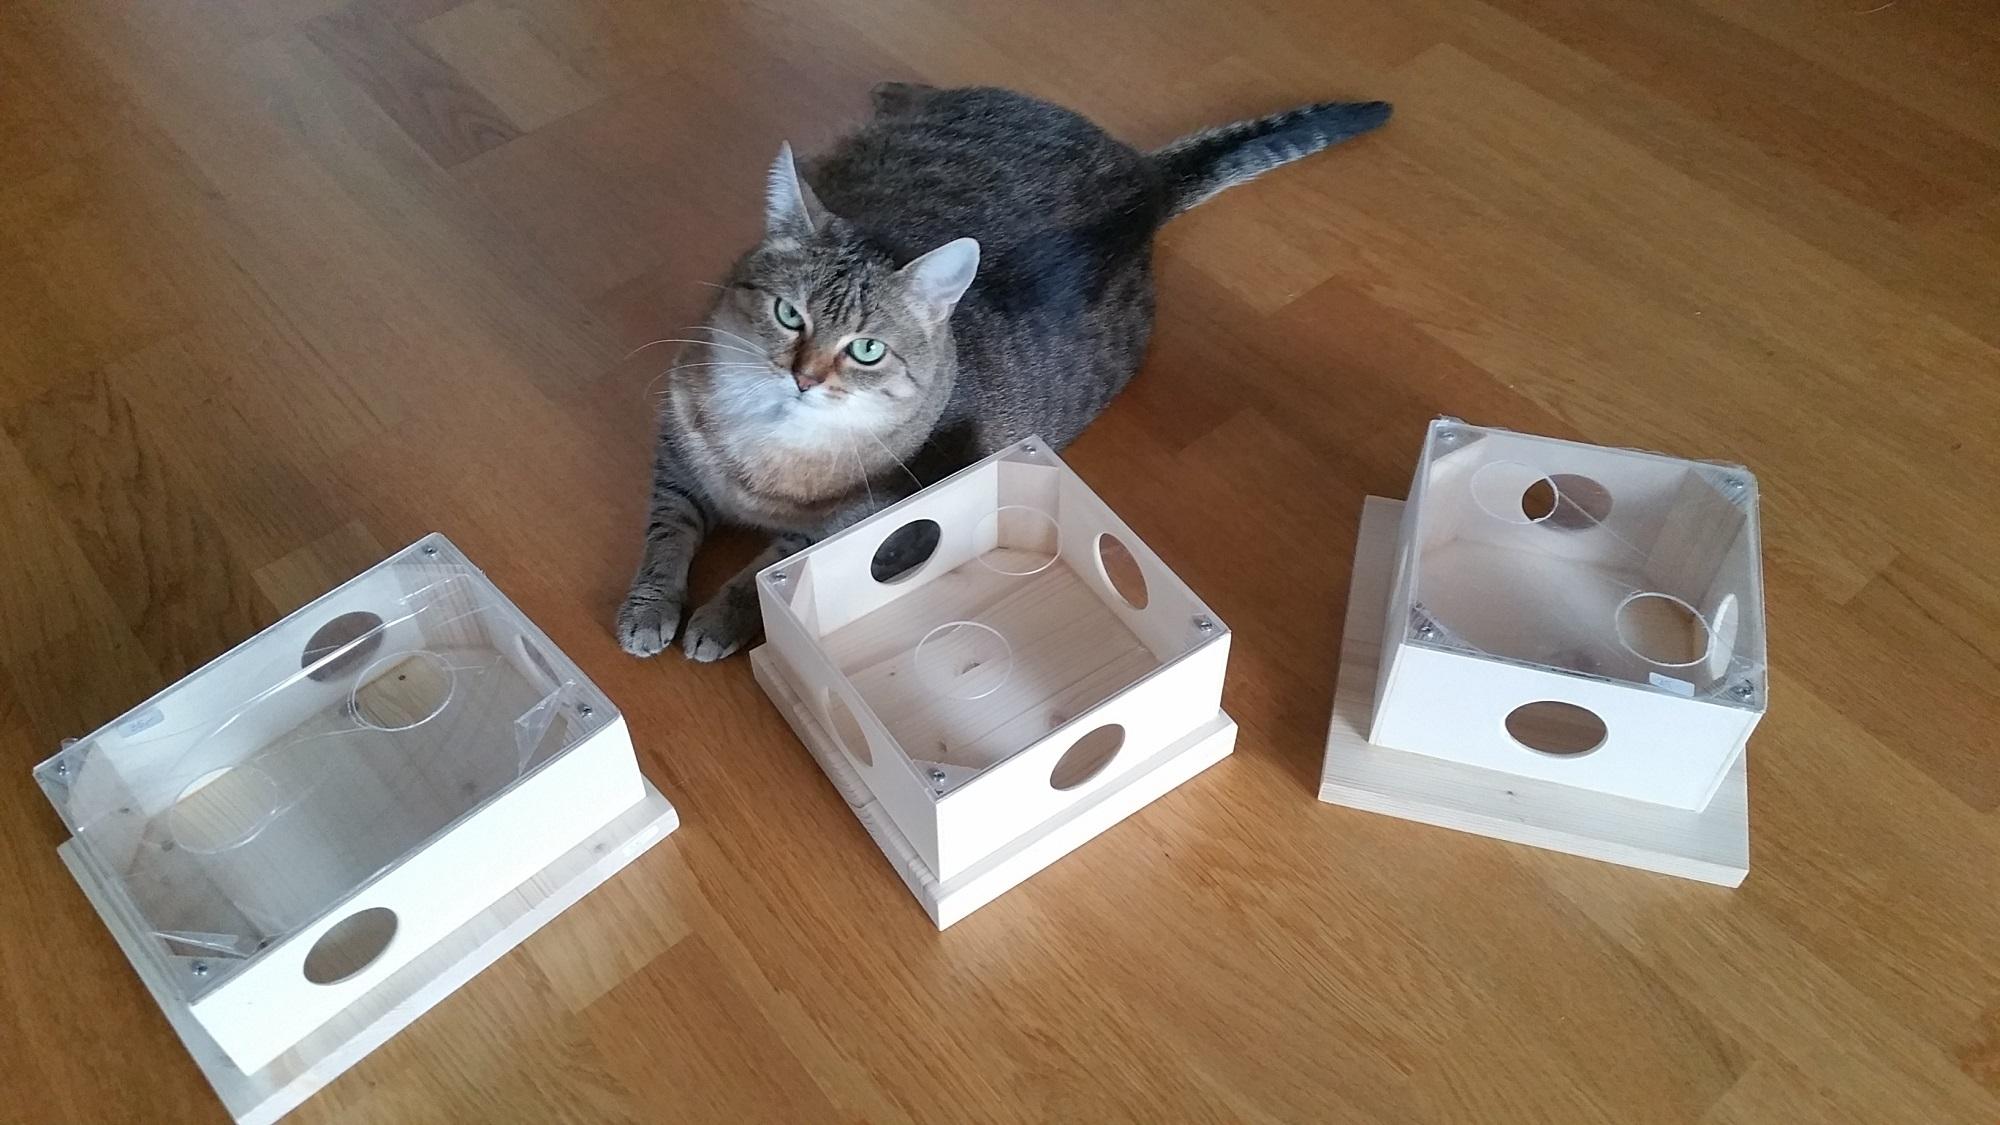 katzenspielzeug fummelbrett intelligenzspielzeug f r katzen. Black Bedroom Furniture Sets. Home Design Ideas